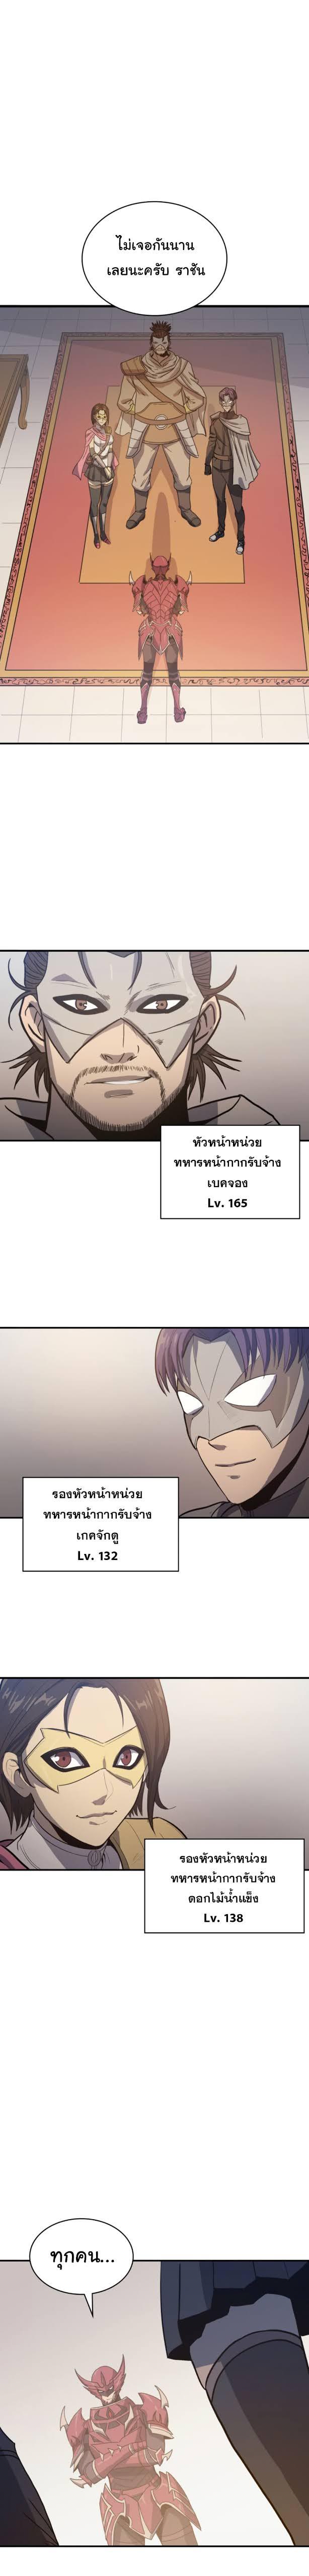 Max Level Returner - หน้า 2